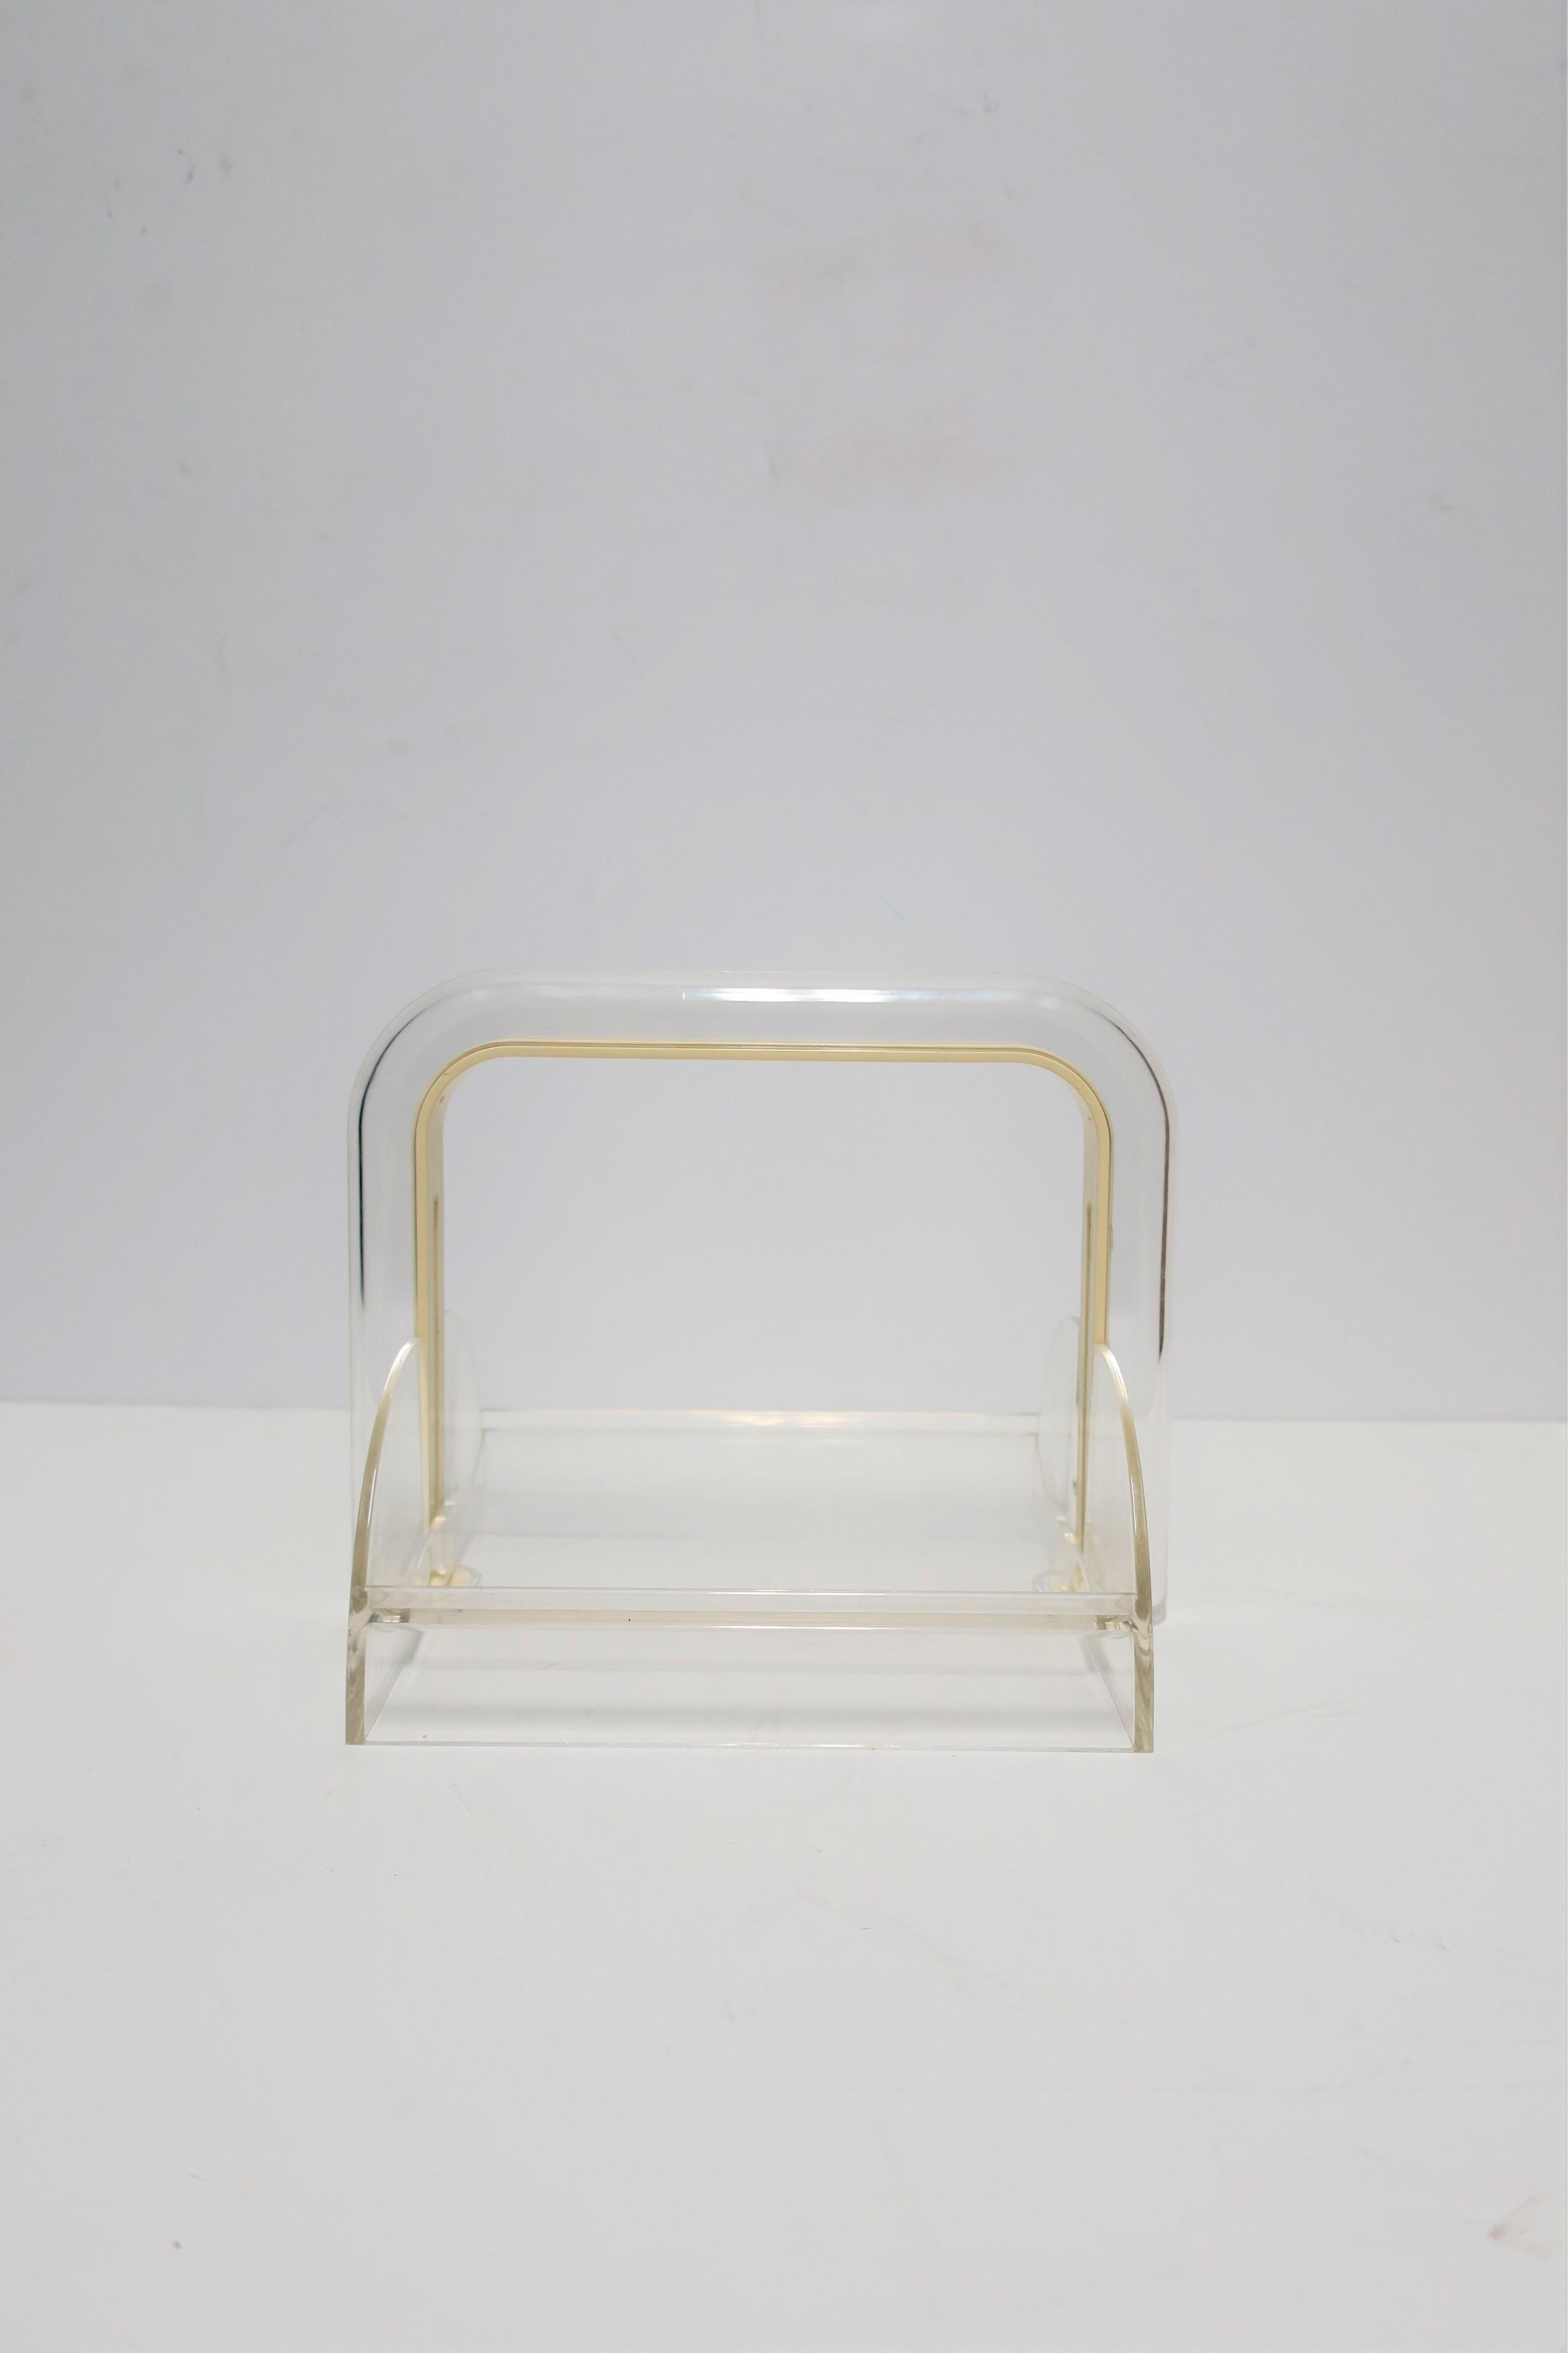 Italian Postmodern Acrylic Napkin Holder By Designer Rede Guzzini For Sale At 1stdibs